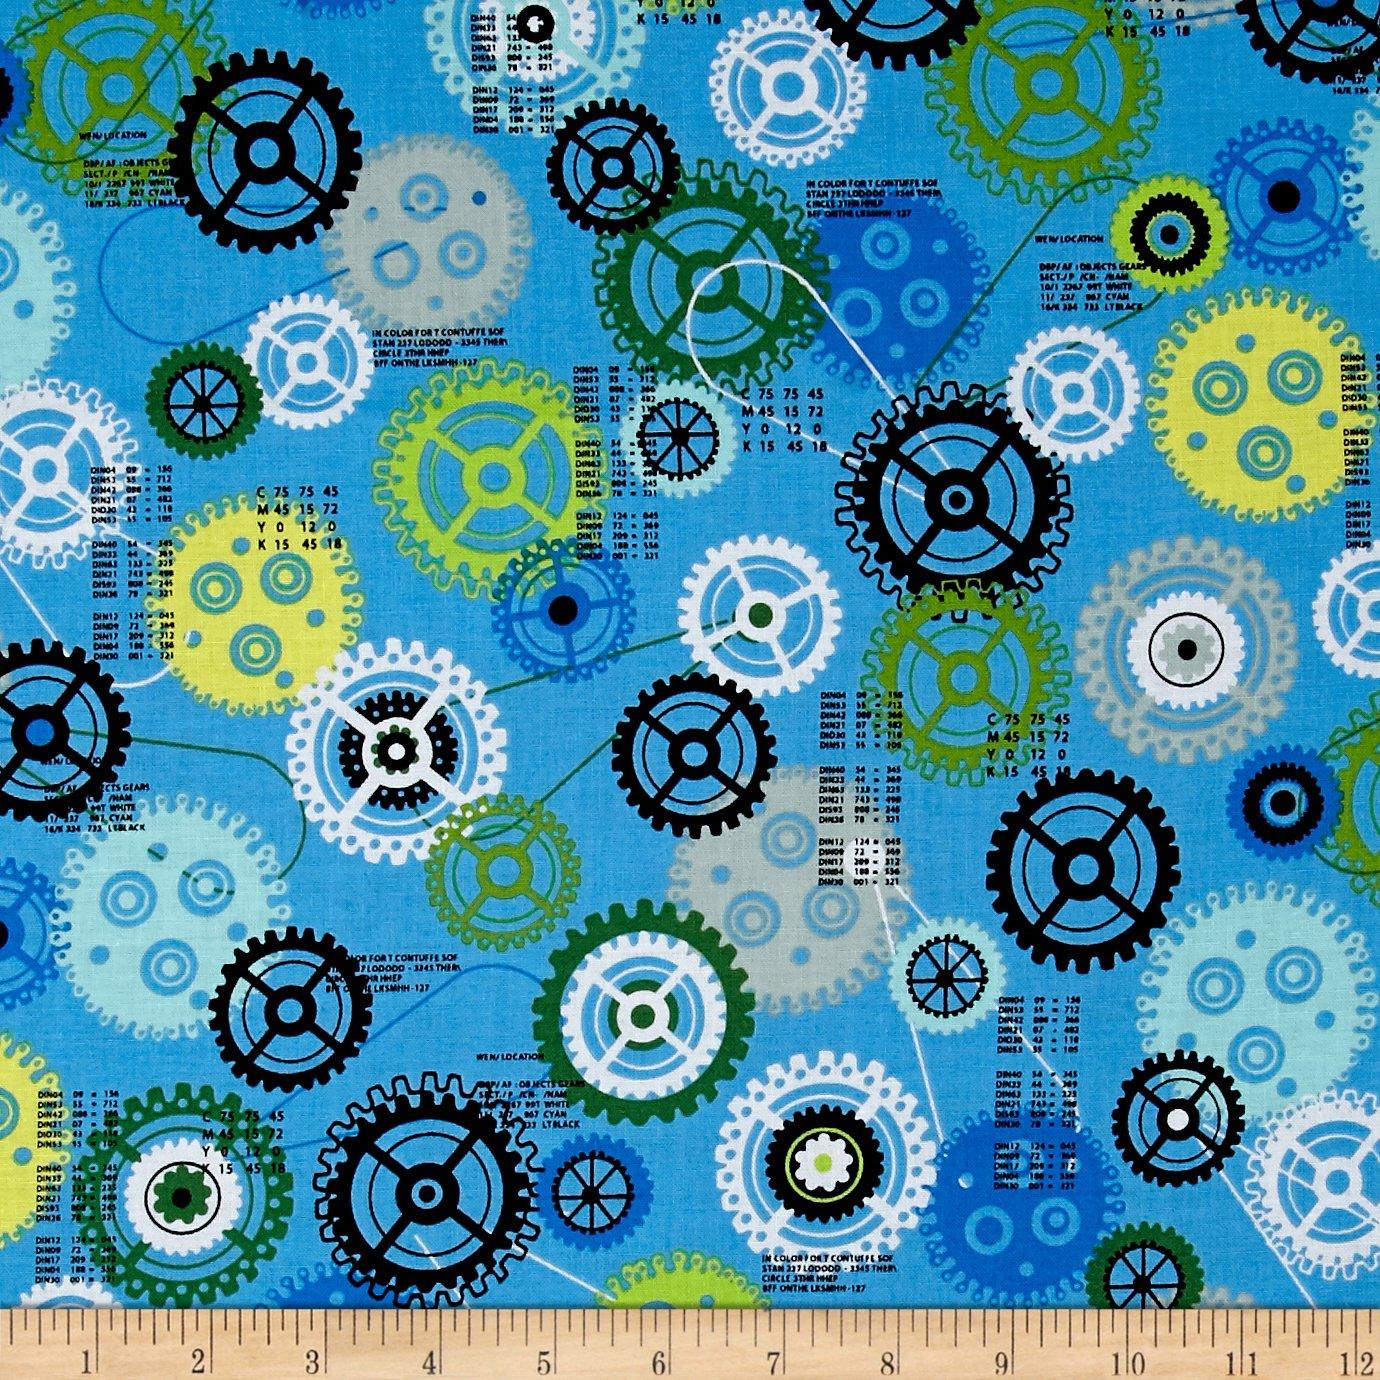 Ibot - blue gears